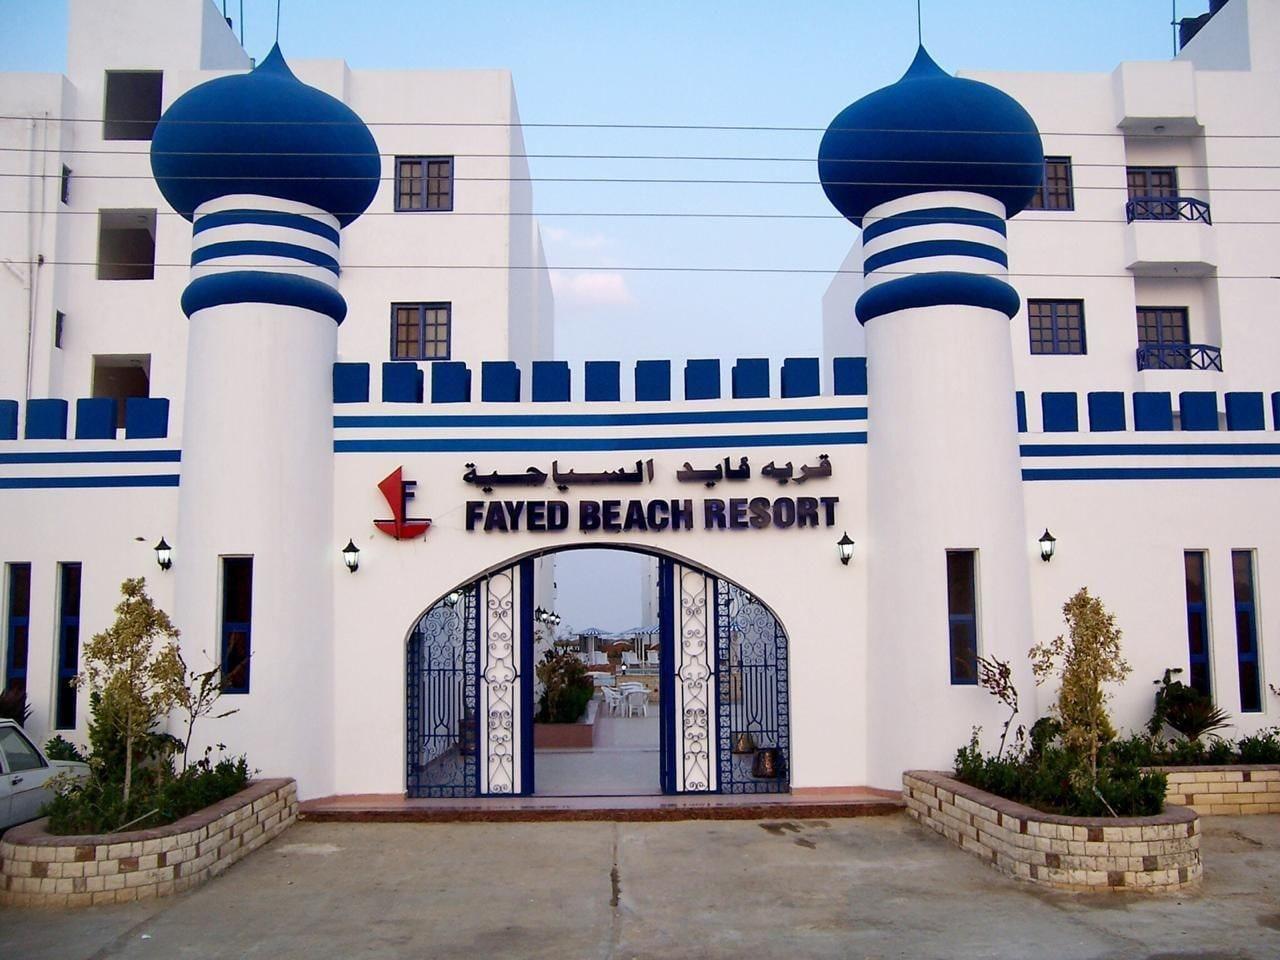 Fayed Beach Resort, Fa'id